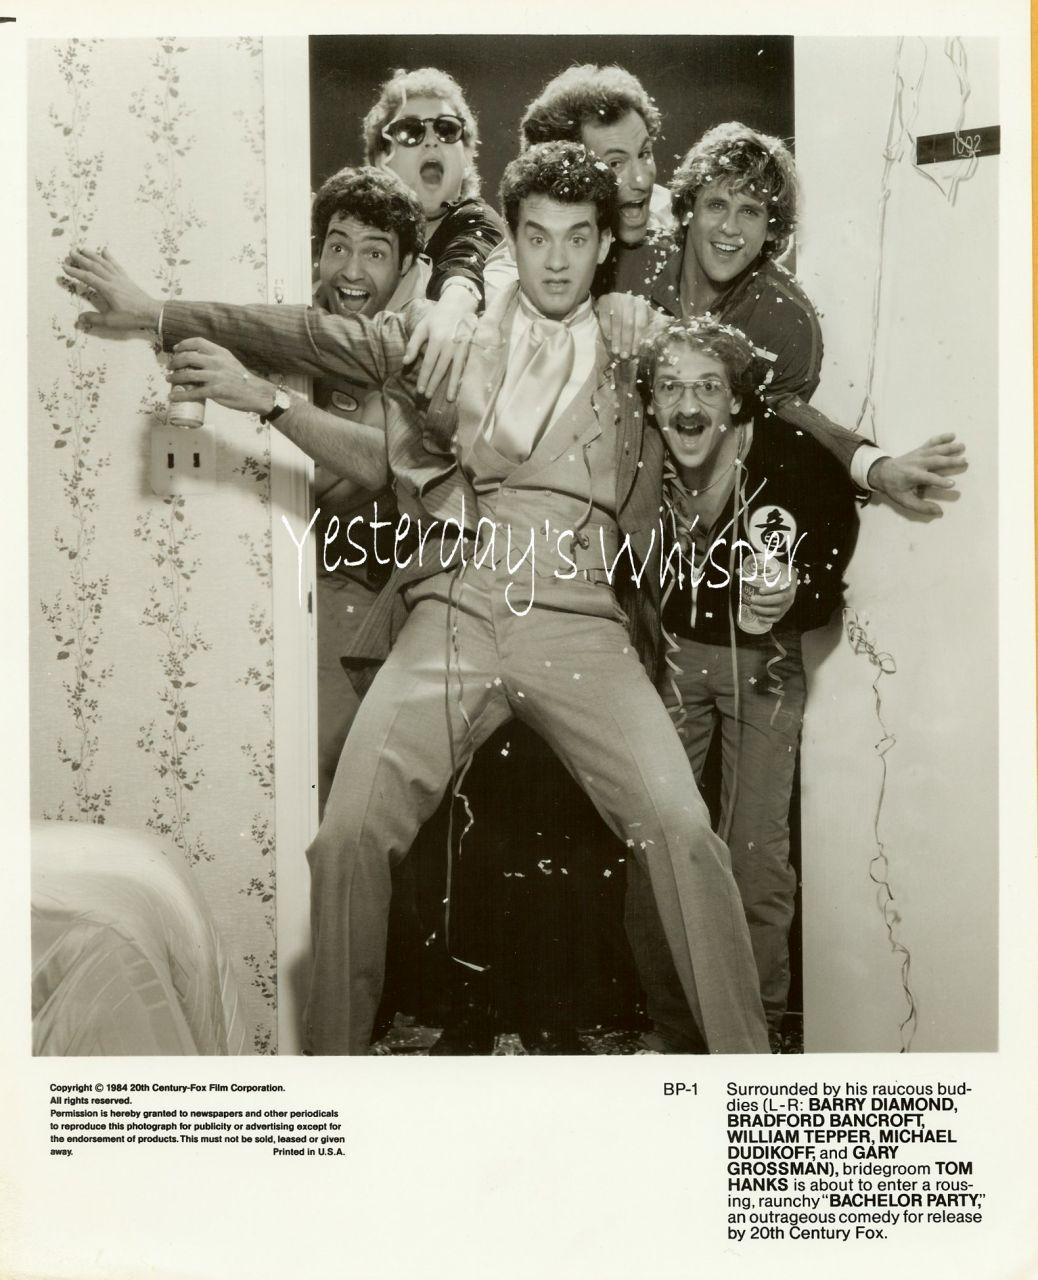 Tom Hanks Bachelor Party 1984 Movie Publicity Photo